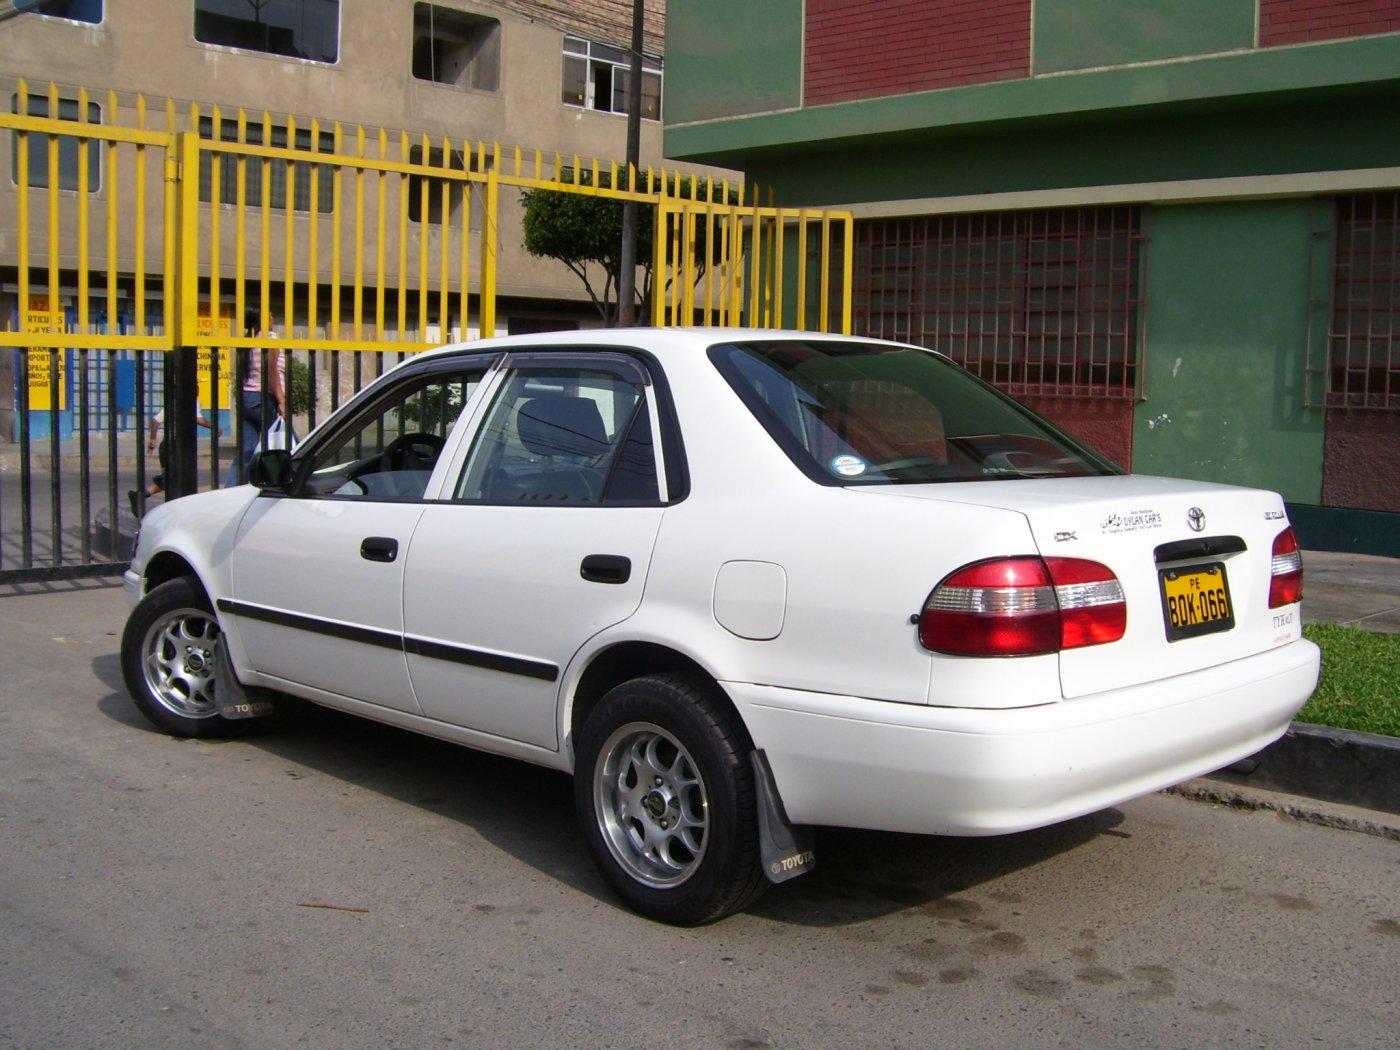 Que Opinion Tienen Del Toyota Corolla 99 Diesel Automatico